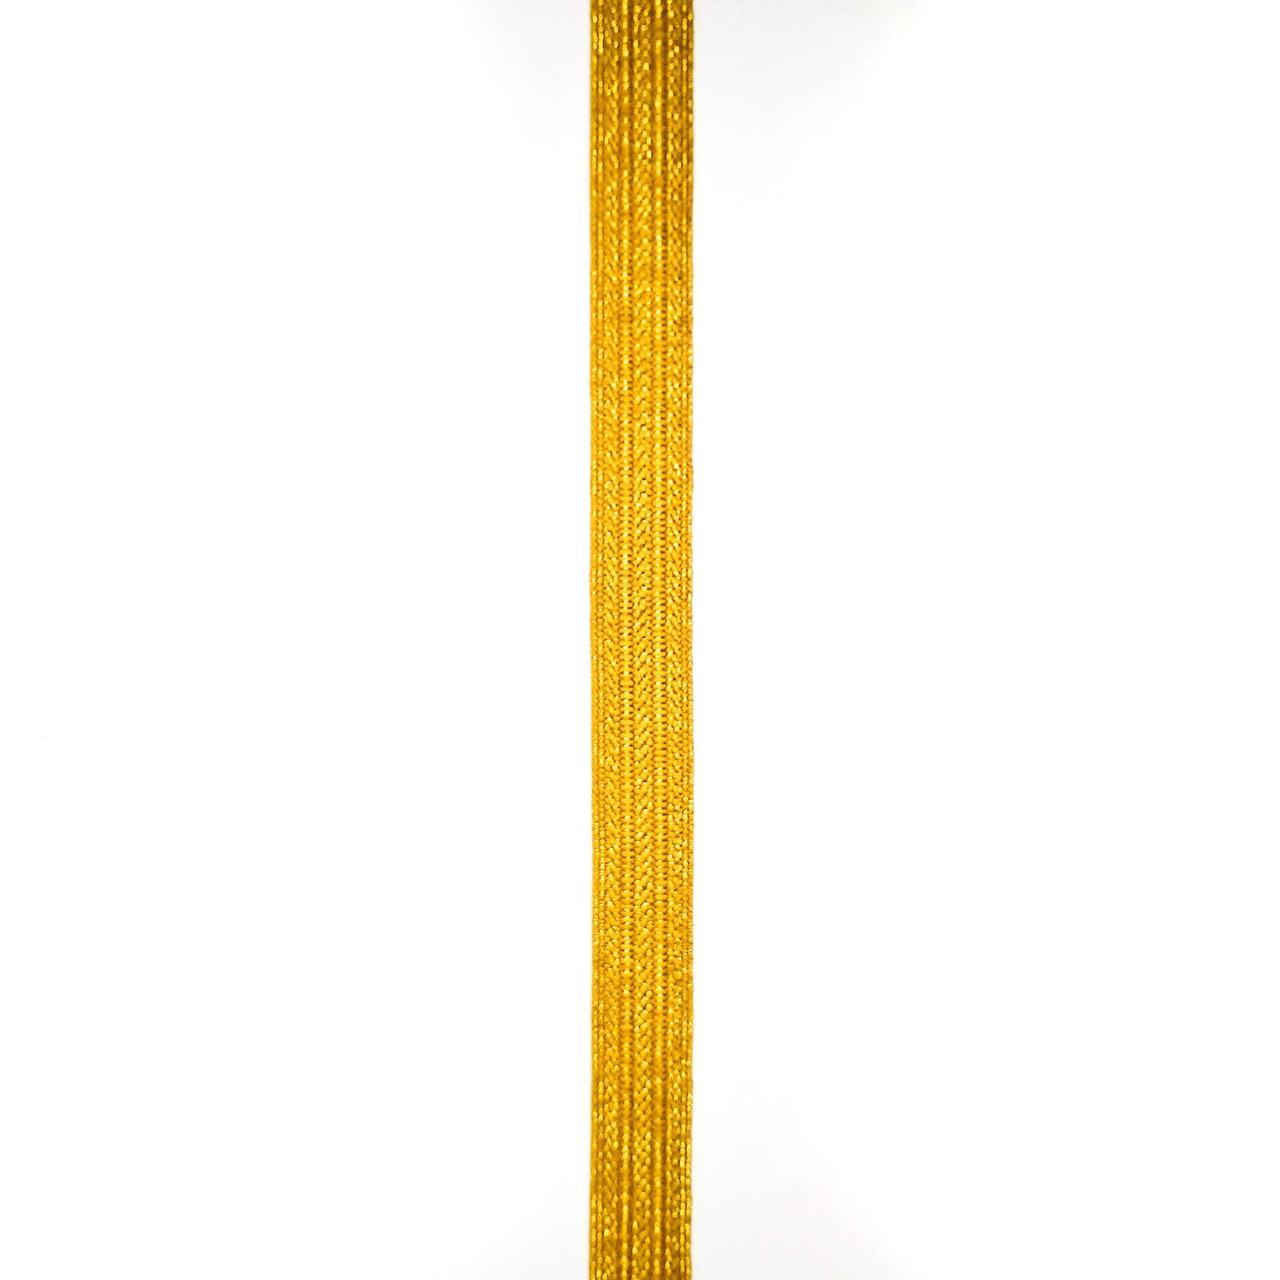 Лента галун с метанитью с узором 13 мм ( 25 м/рулон)